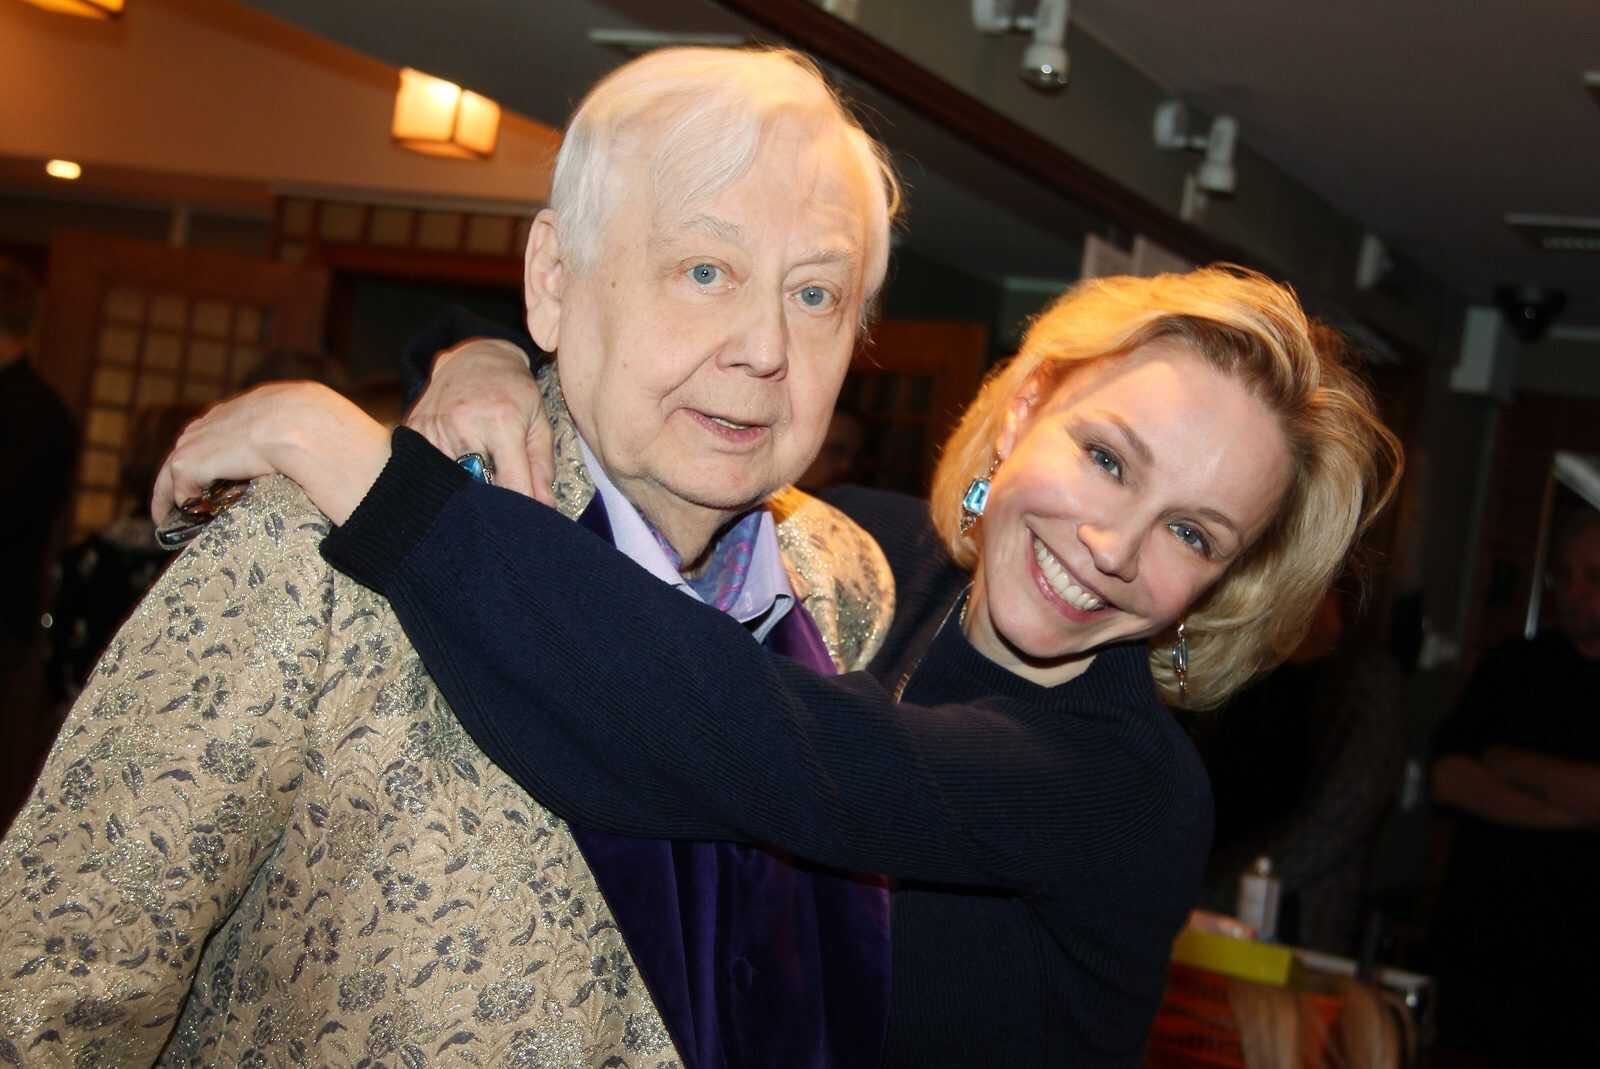 Марина Зудина вспомнила, как упрашивала Олега Табакова родить ему ребёнка